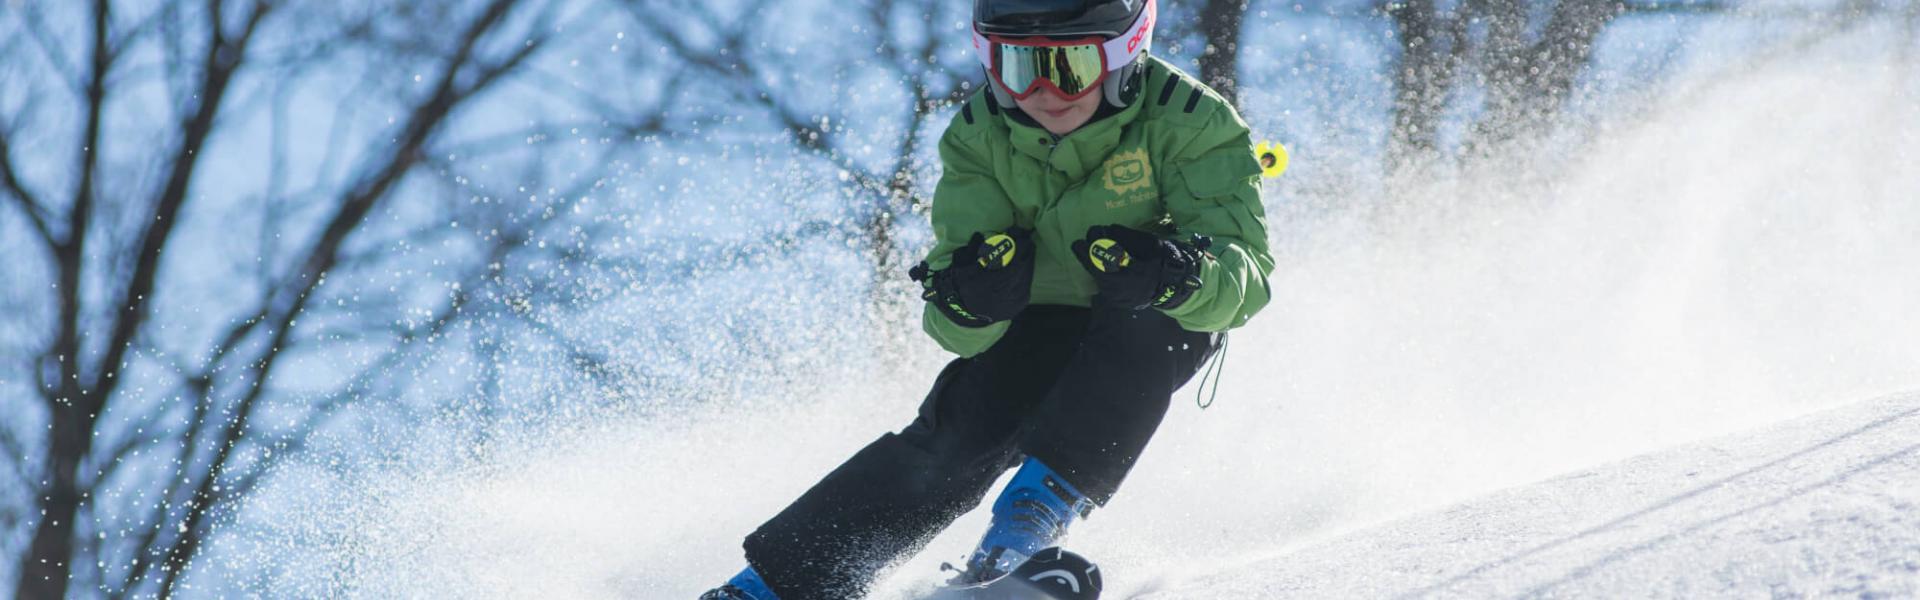 Person som står på slalomski i nedoverbakke